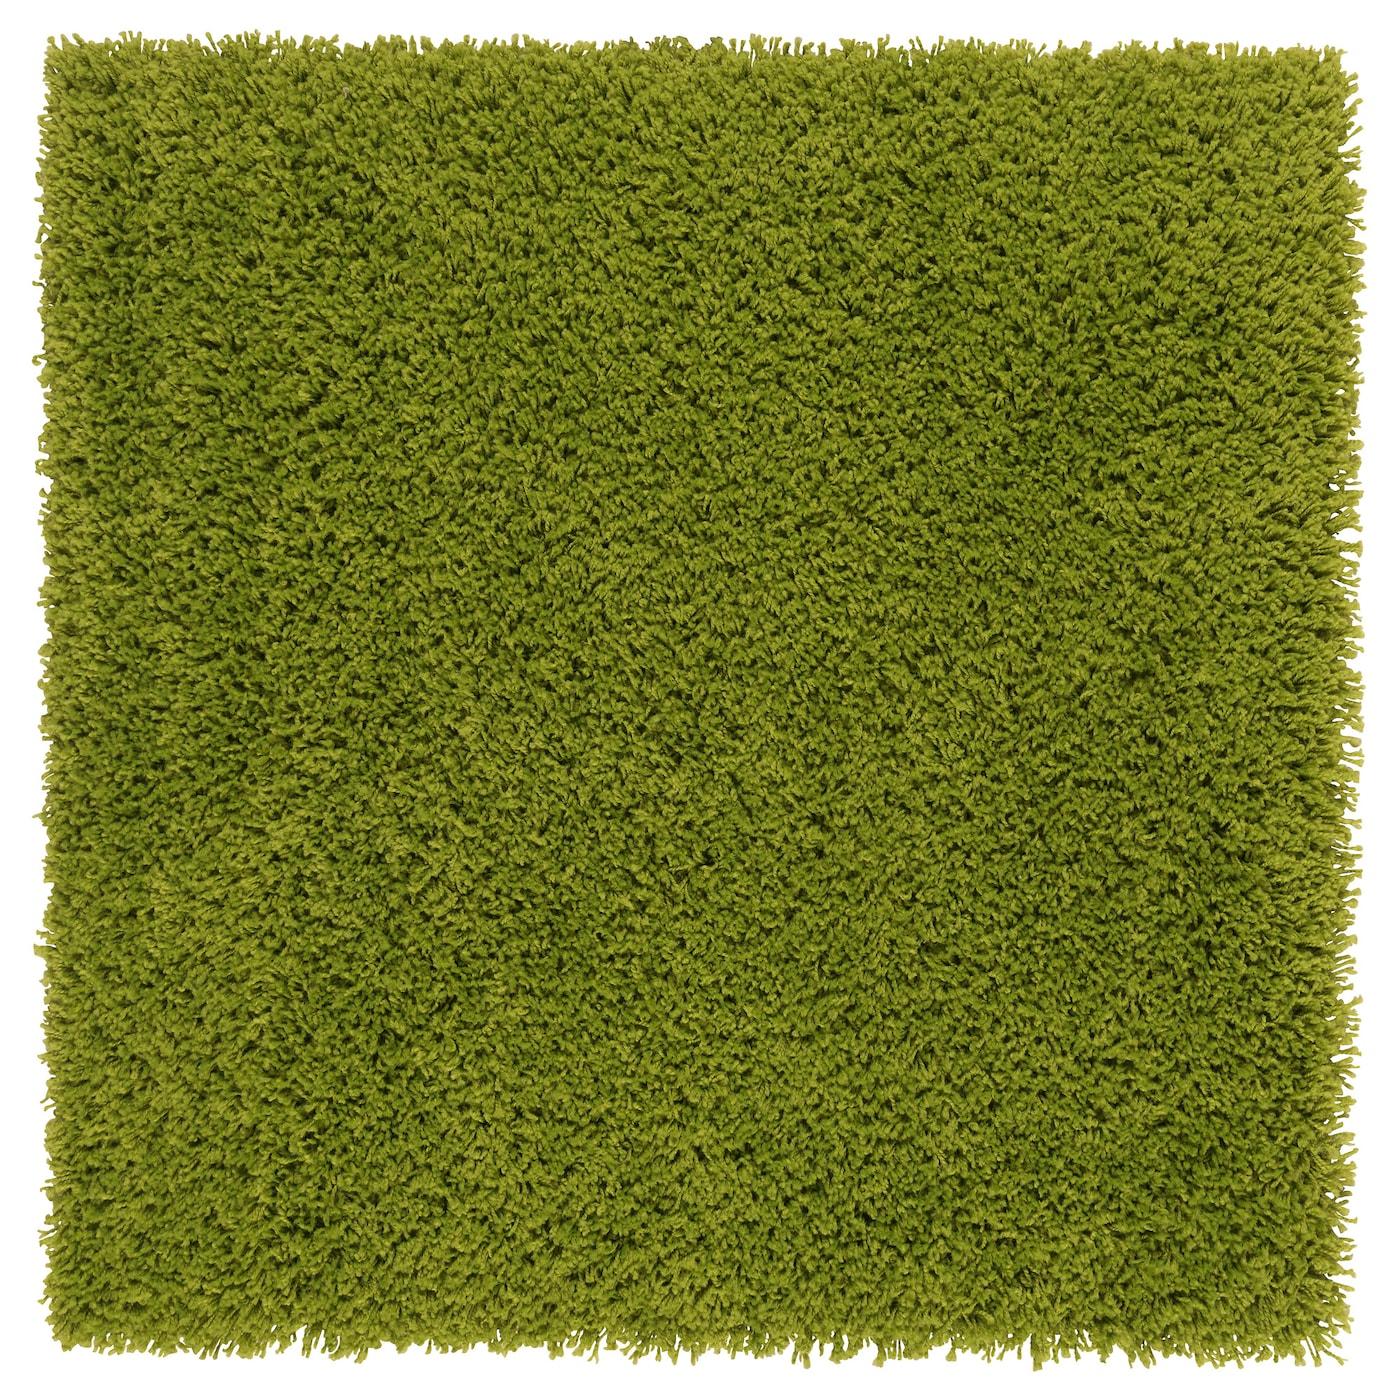 Hampen rug high pile bright green 80x80 cm ikea - Alfombra verde ikea ...